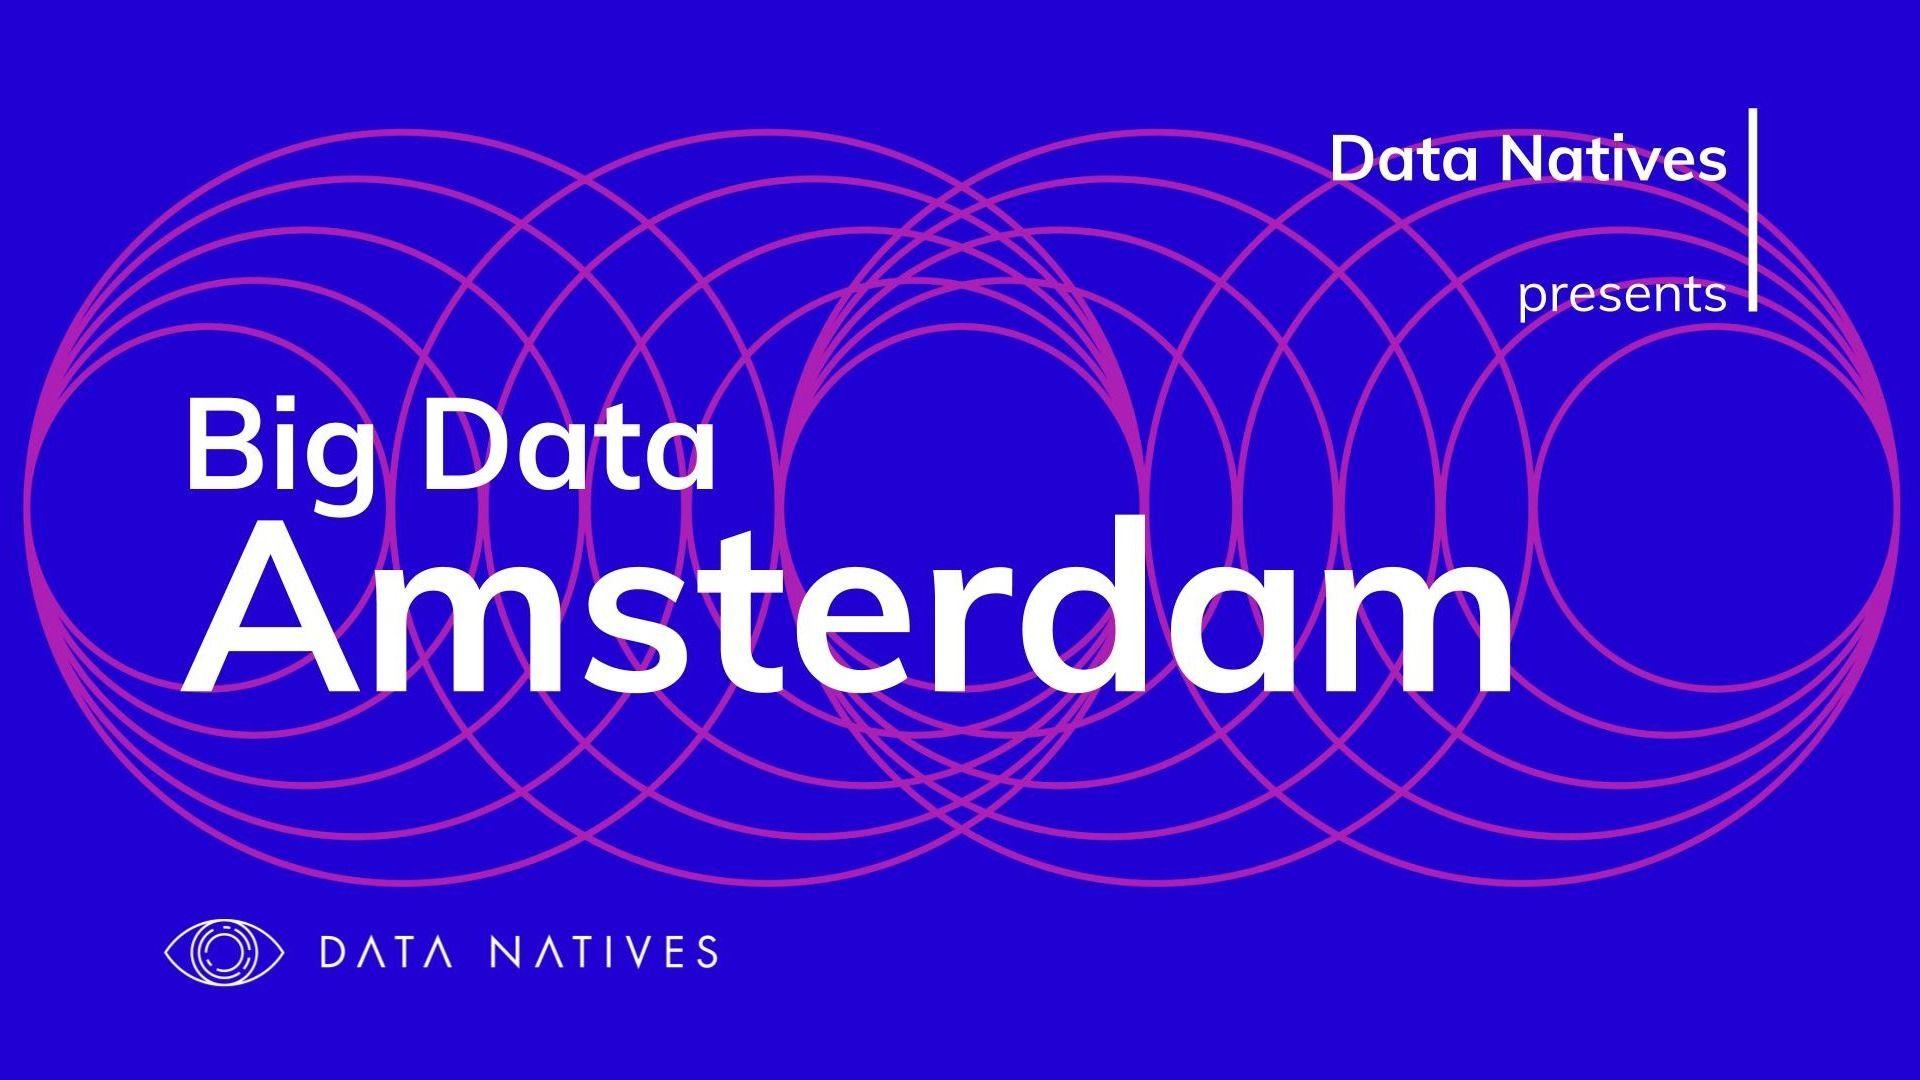 Big Data, Amsterdam